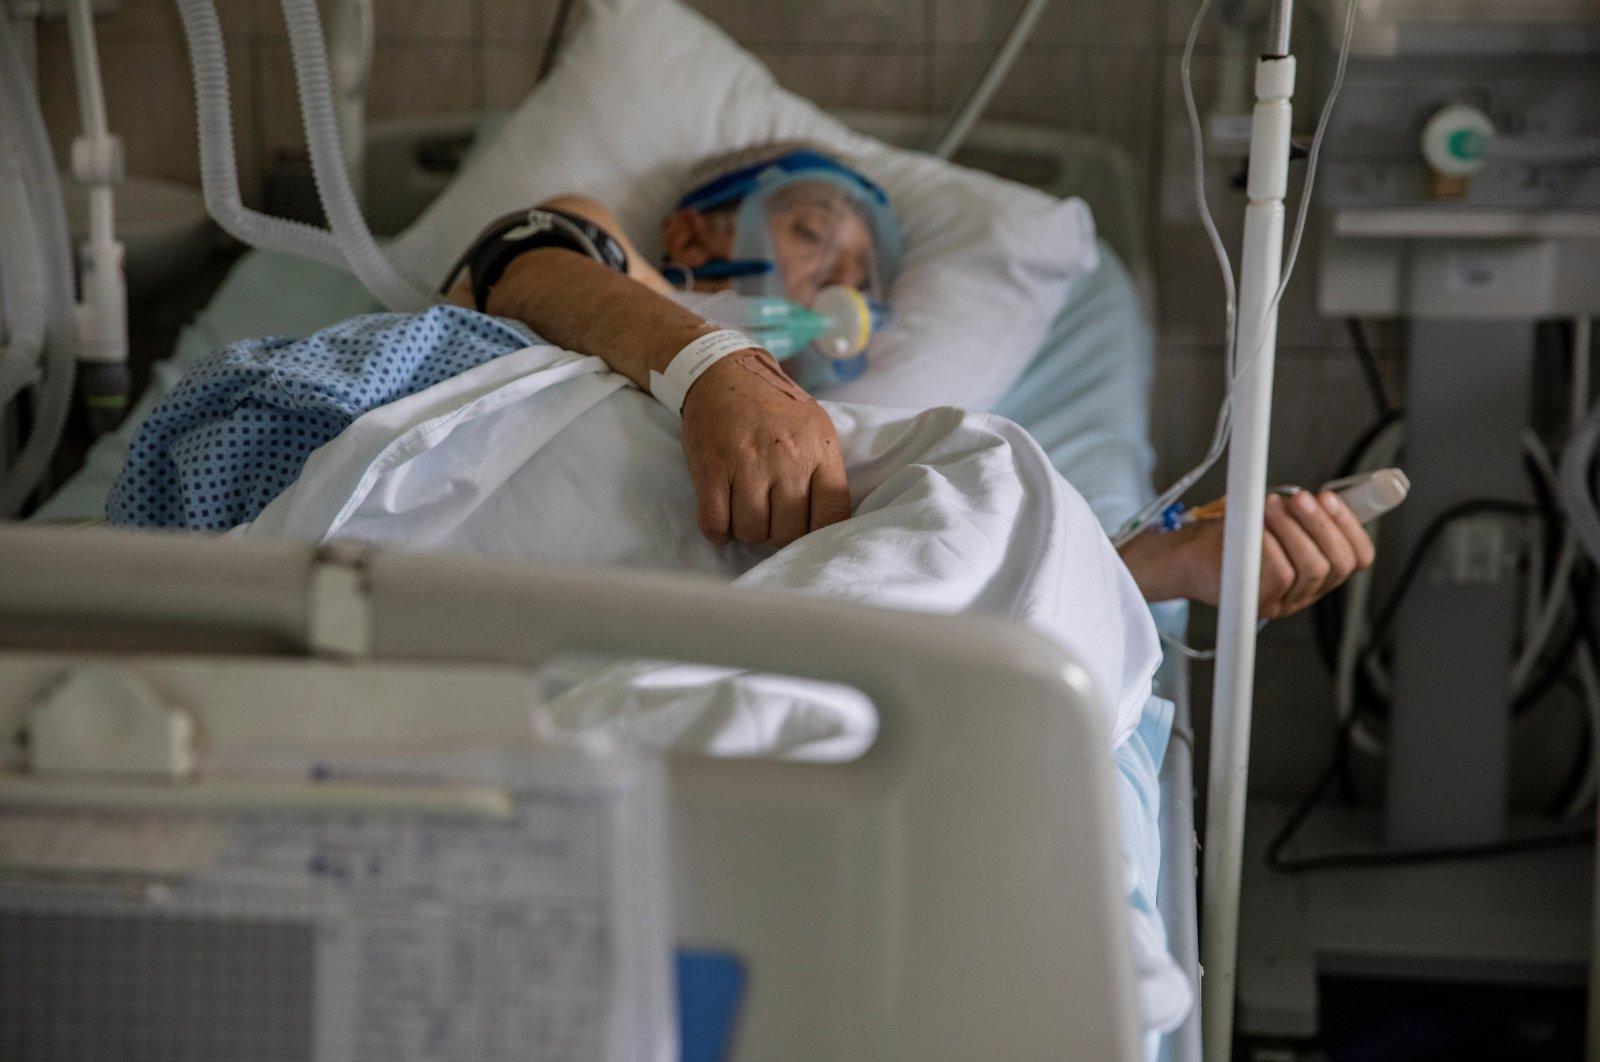 A patient suffering from the coronavirus disease (COVID-19) lies in bed at University Hospital Medical Center Bezanijska kosa in Belgrade, Serbia, July 25, 2020. (Reuters Photo)